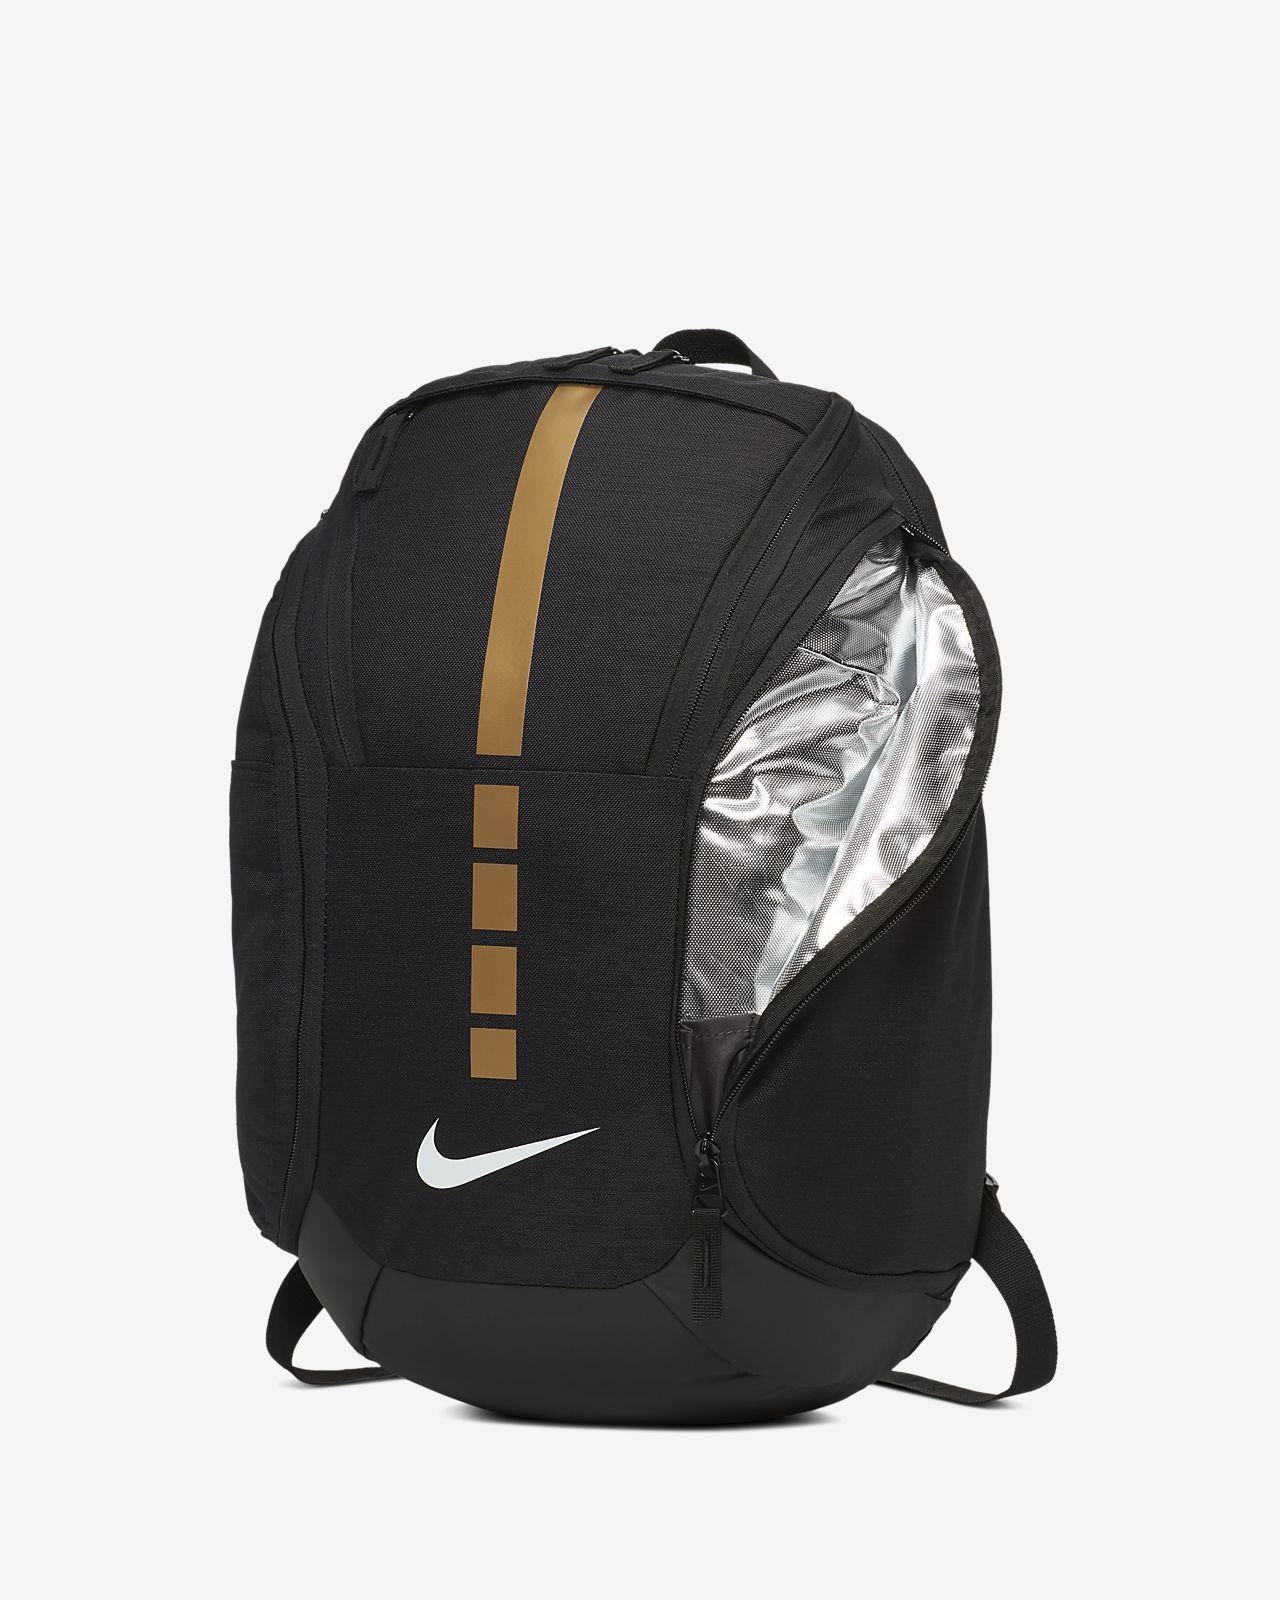 nike hoops elite max air team 2.0 backpack gold | eBay